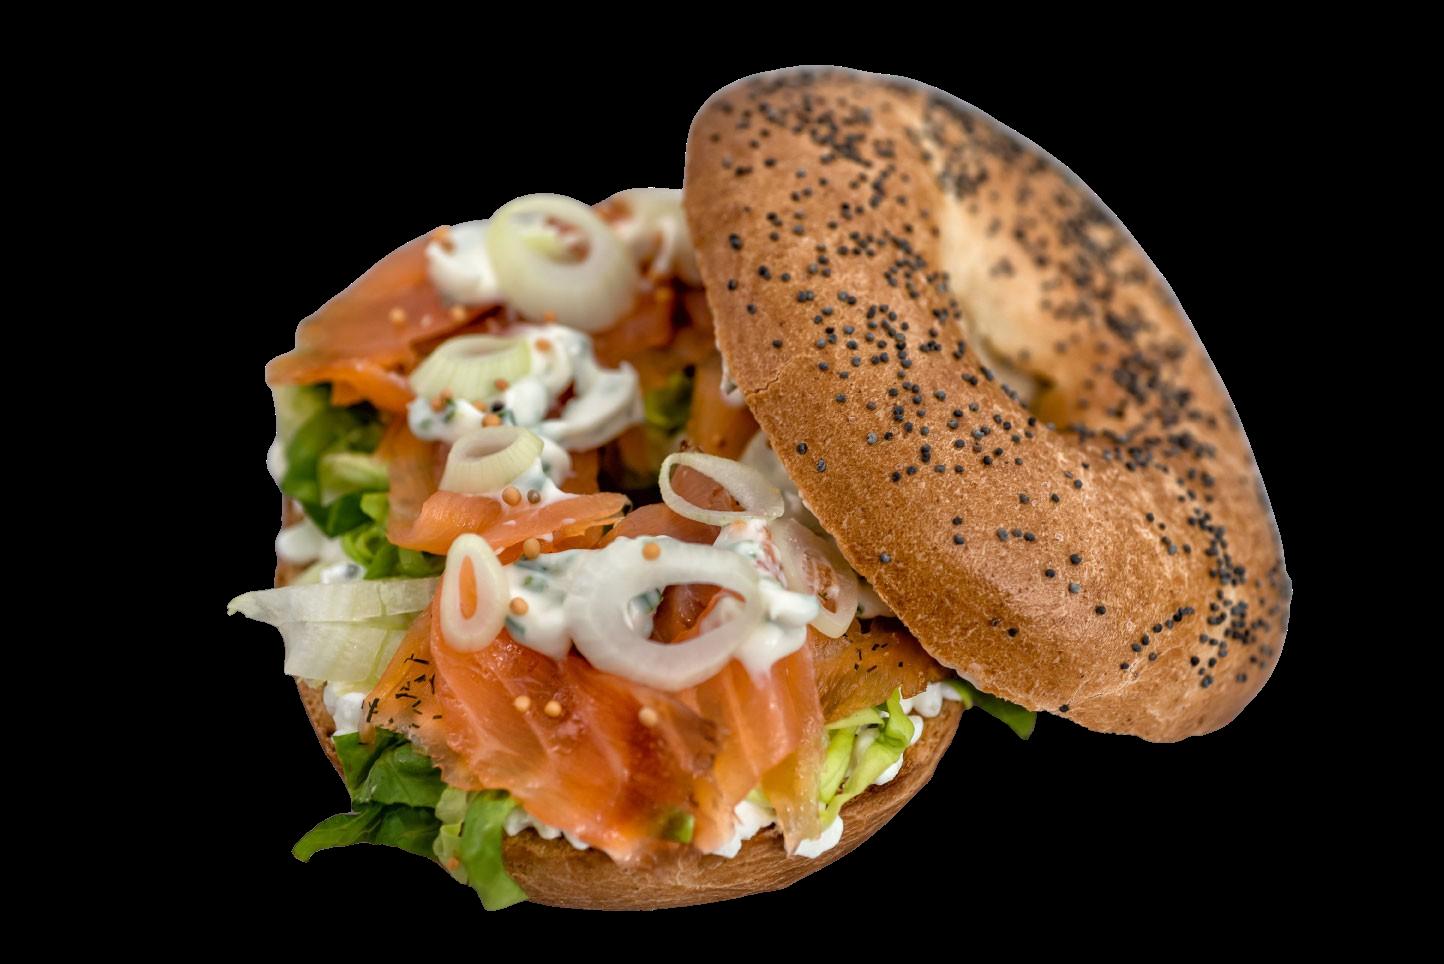 salmon-bagel-with-cream-cheese-fresh-herbs-and-veg-DY9FYE4-removebg